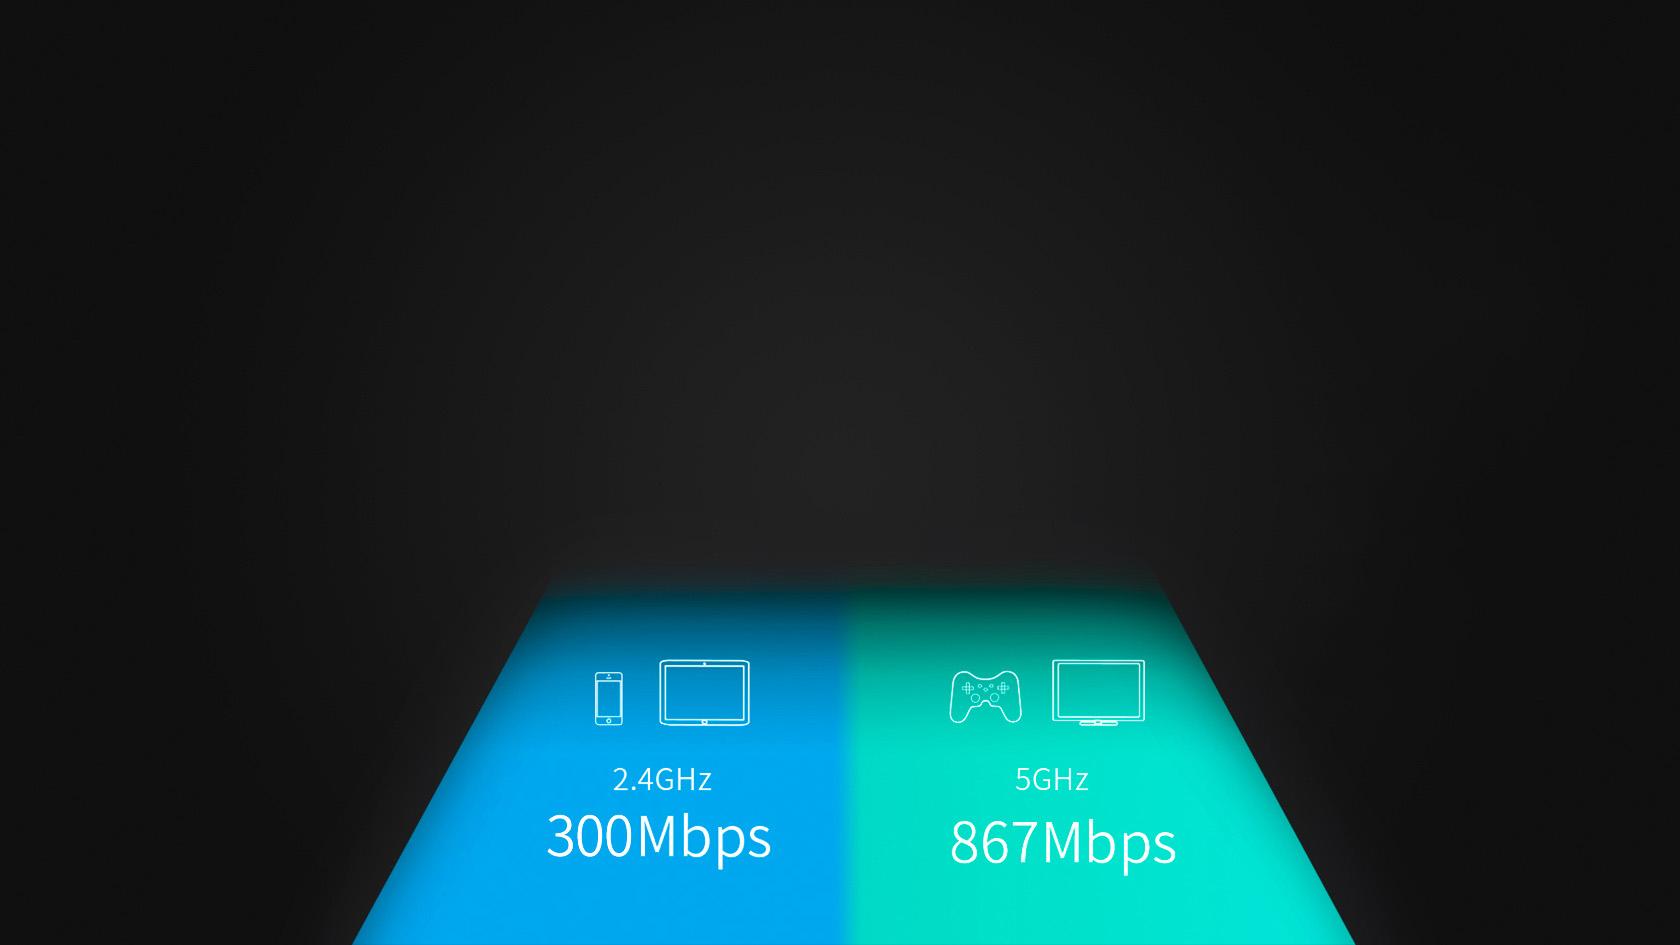 2.4GHZ+5GHZ双频段,信号更强更稳定